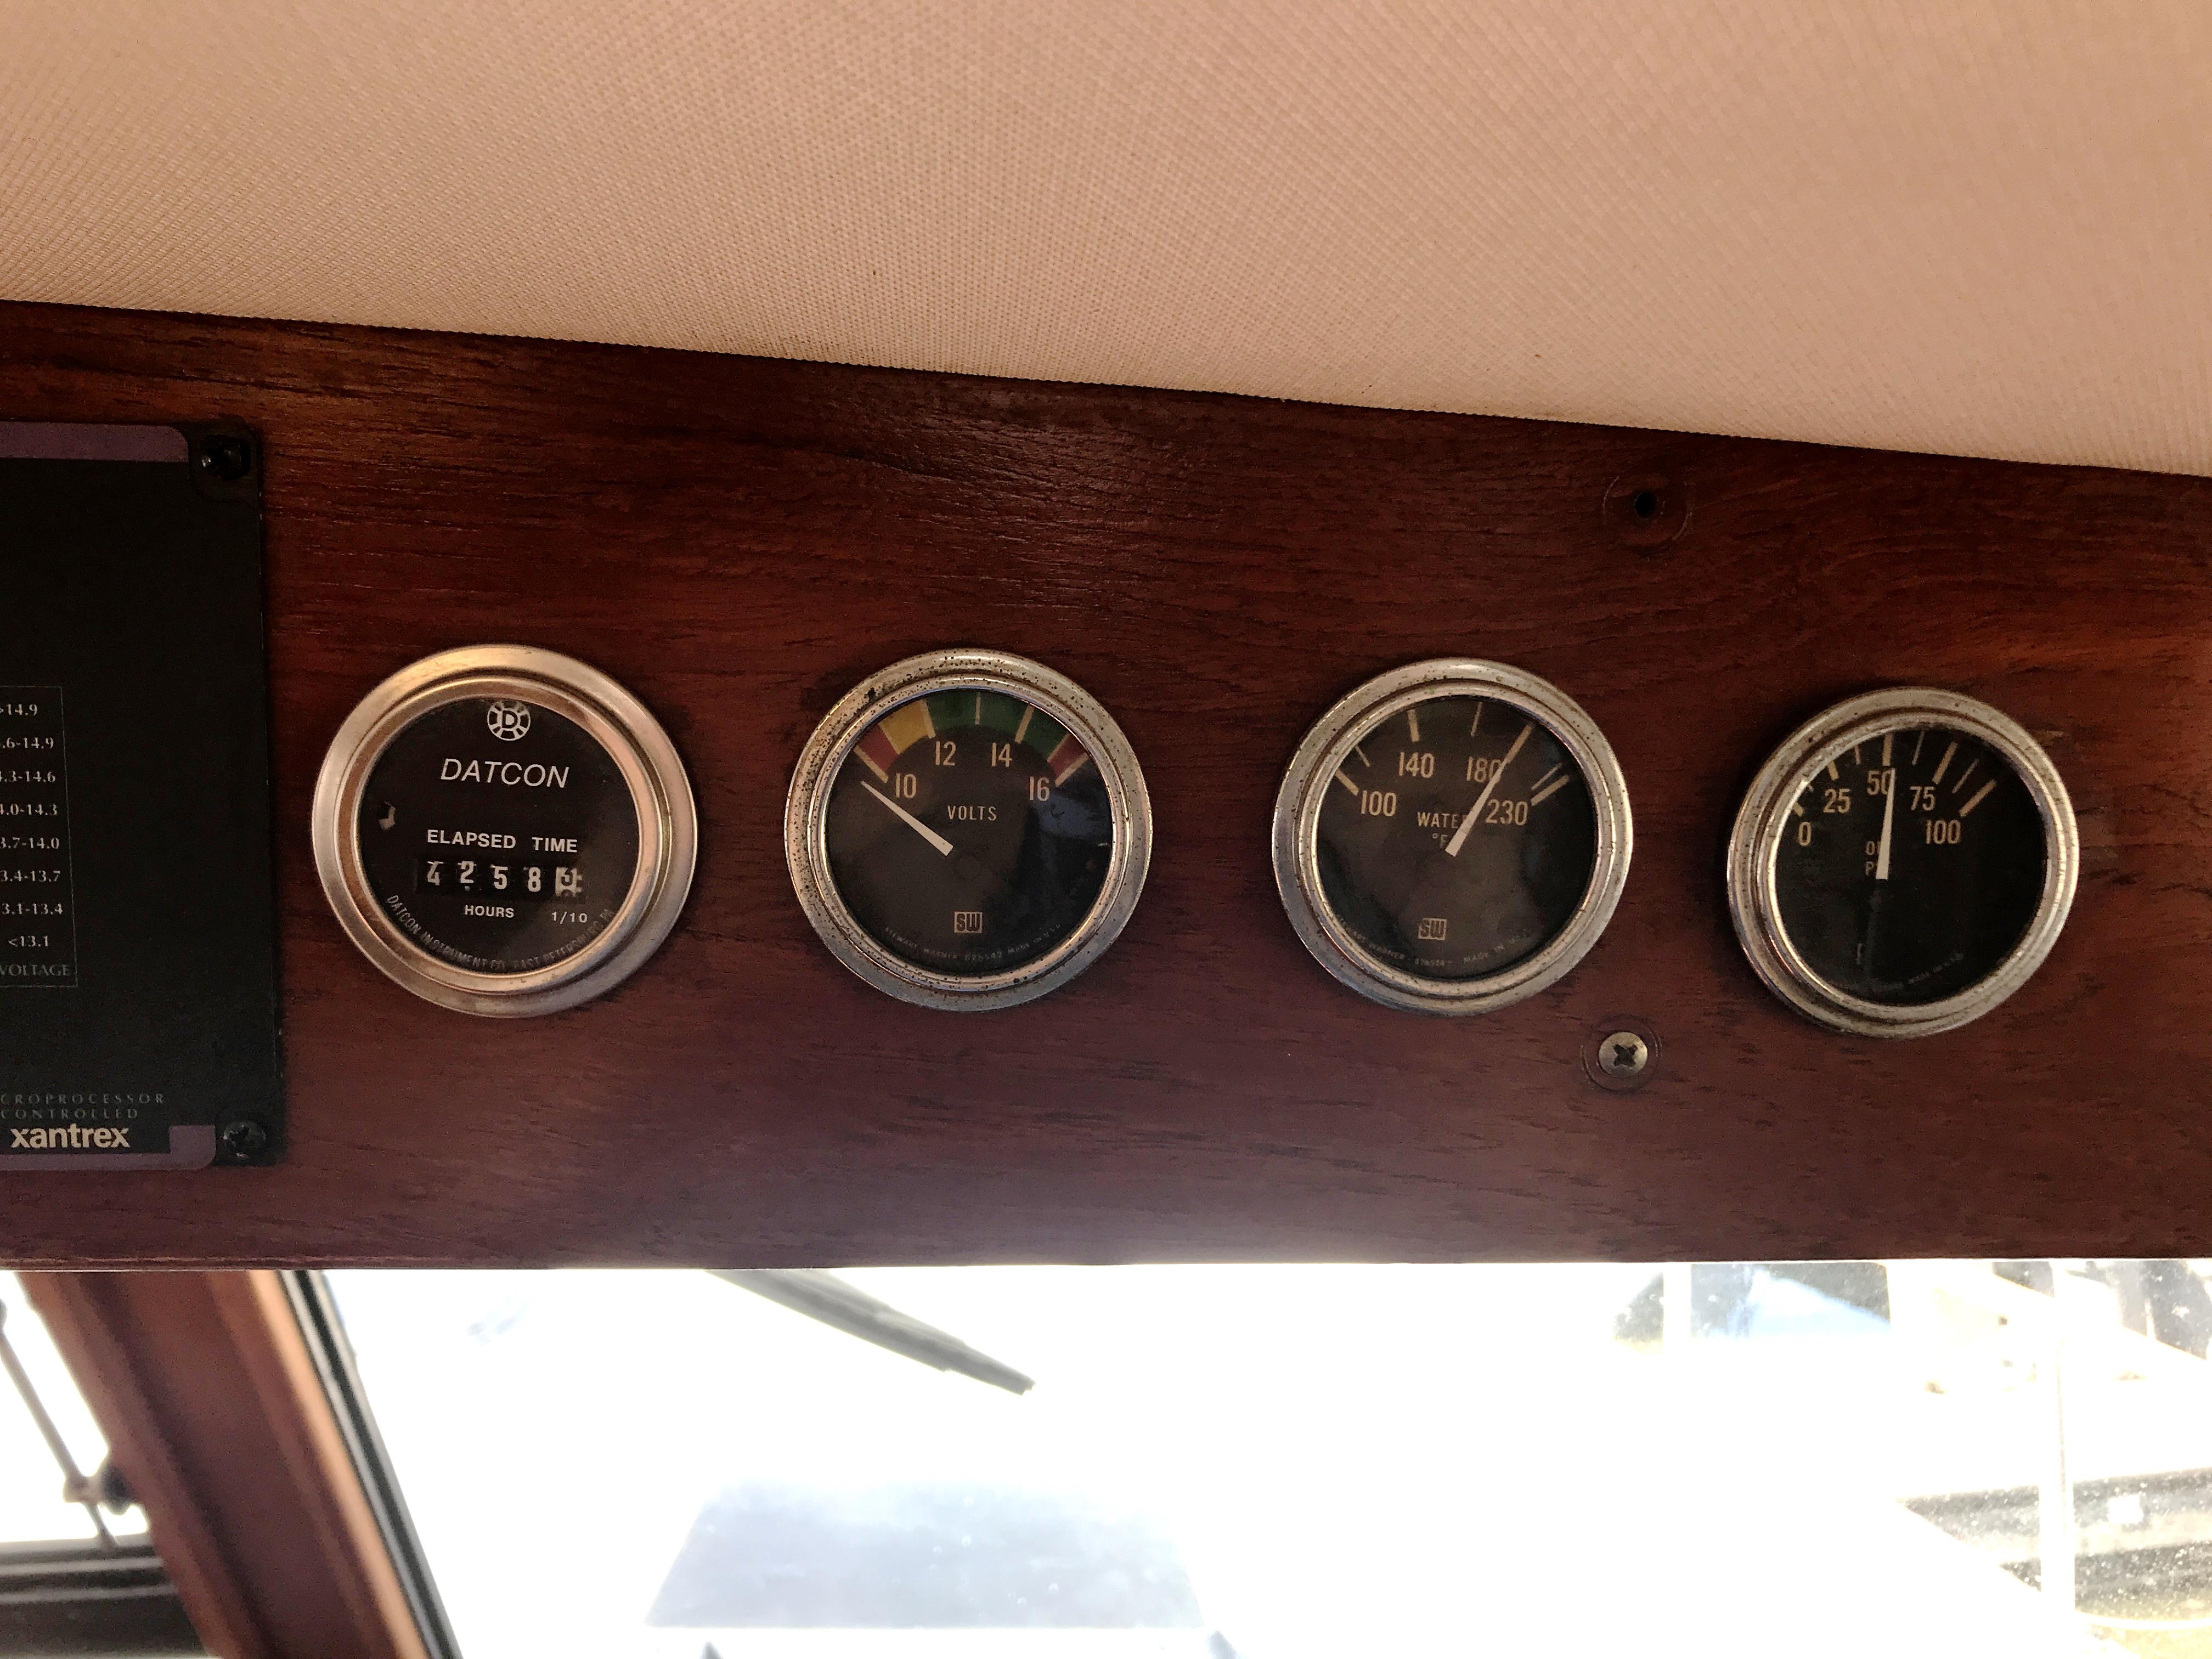 Sea Ranger SUNDECK - generator gauges